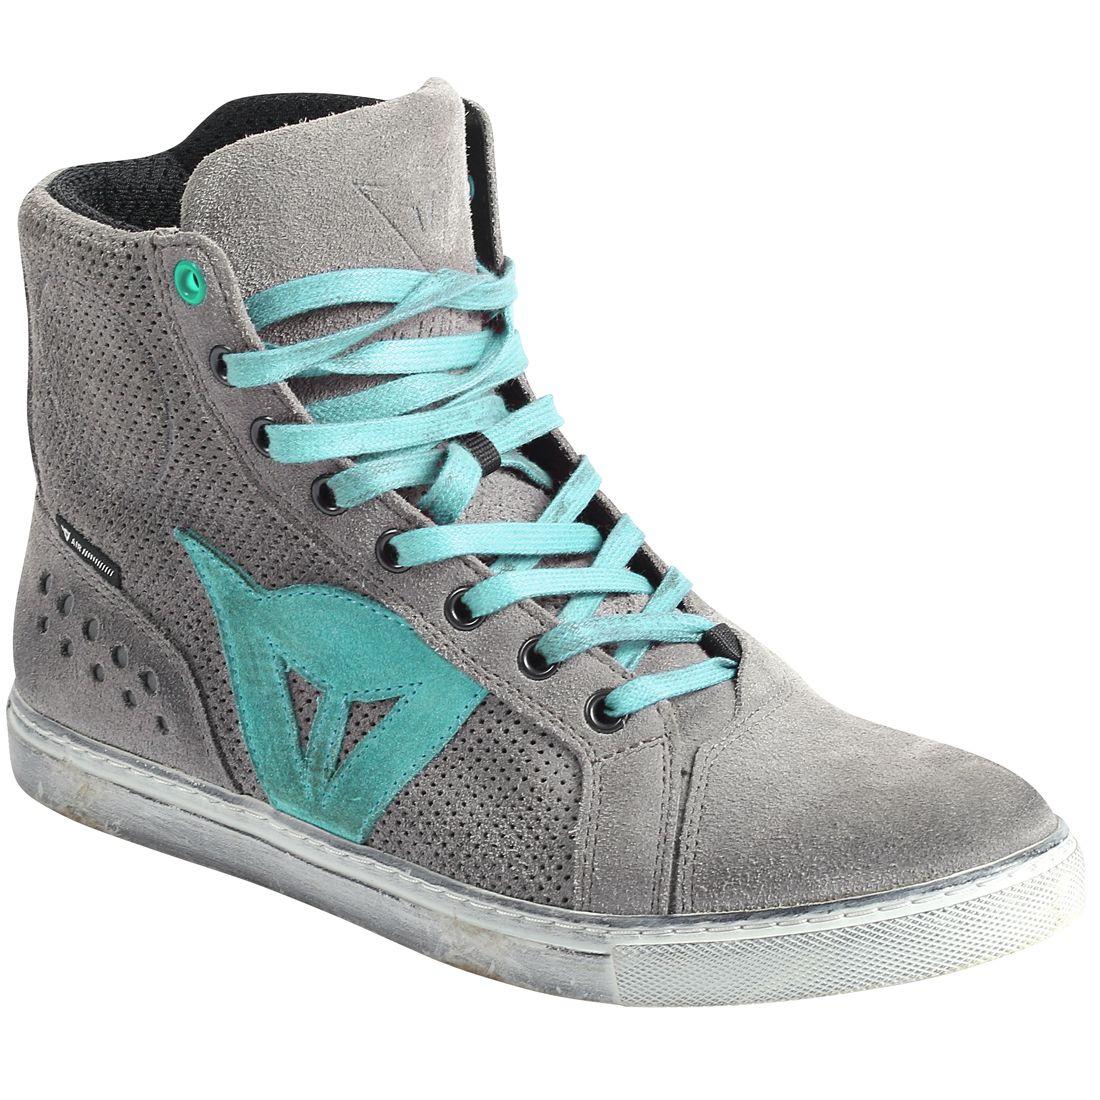 【DAINESE】STREET BIKER AIR 女用車鞋 - 「Webike-摩托百貨」